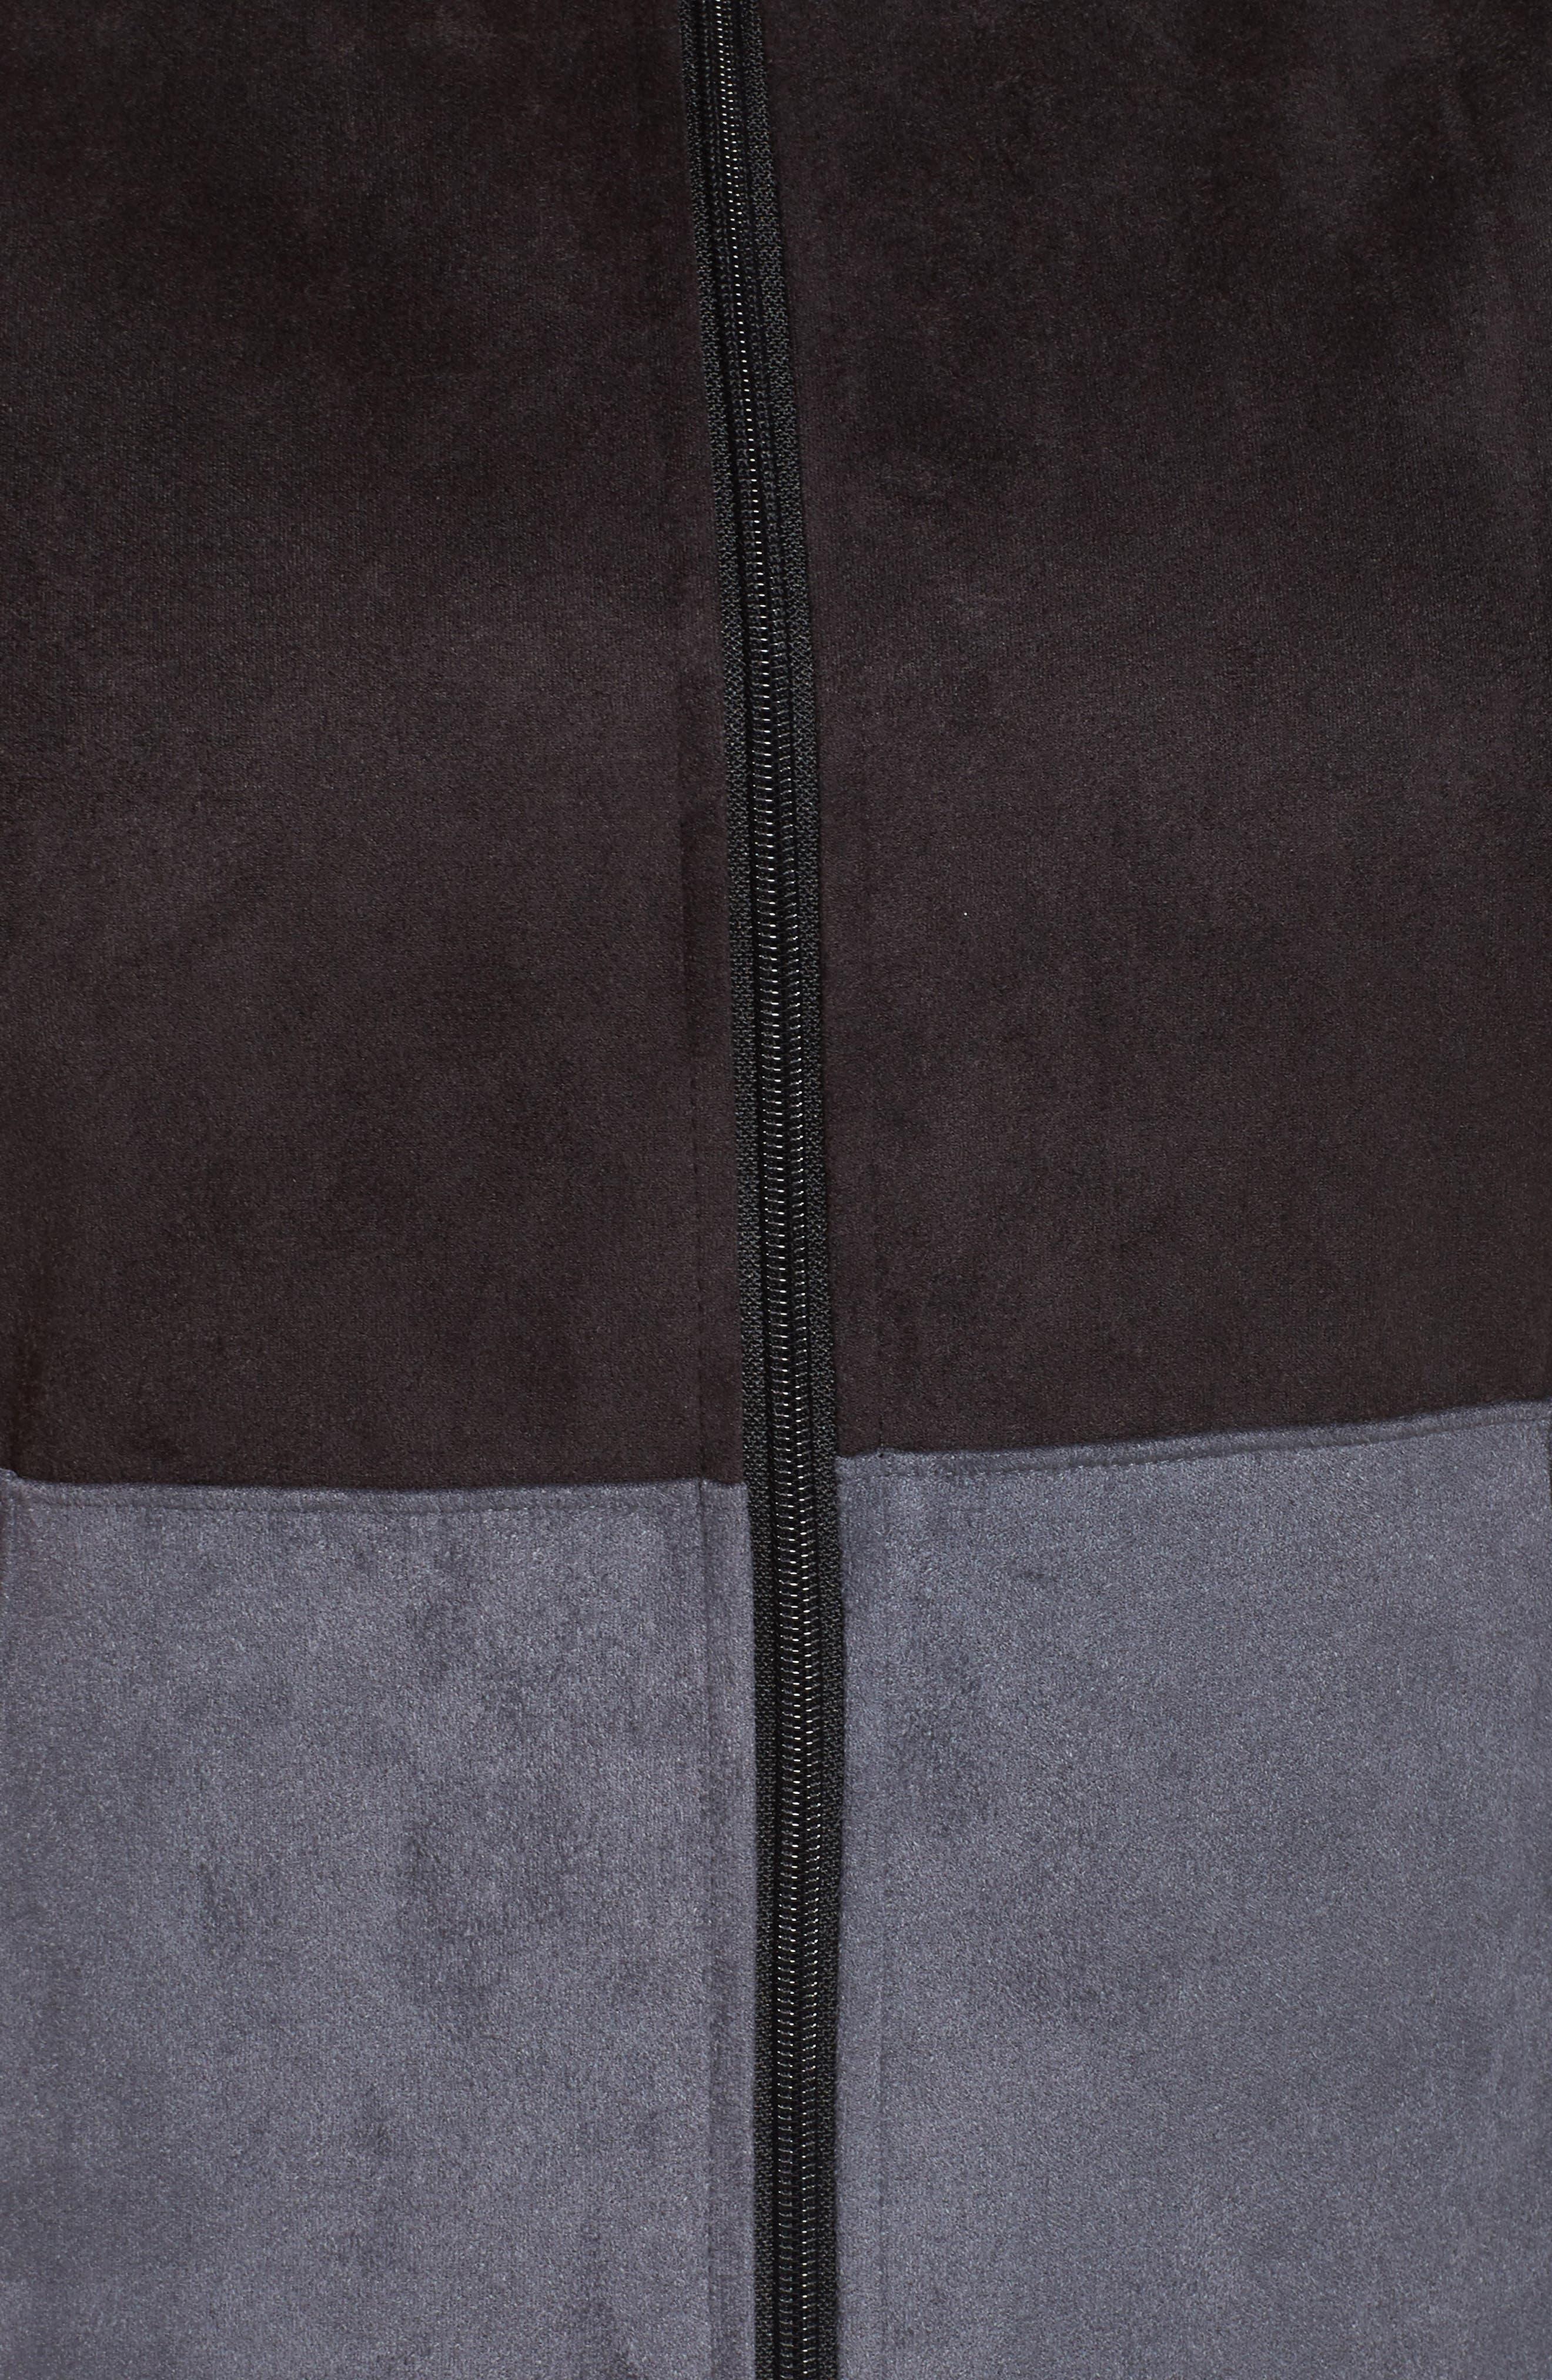 Track Jacket,                             Alternate thumbnail 6, color,                             Black/ Charcoal